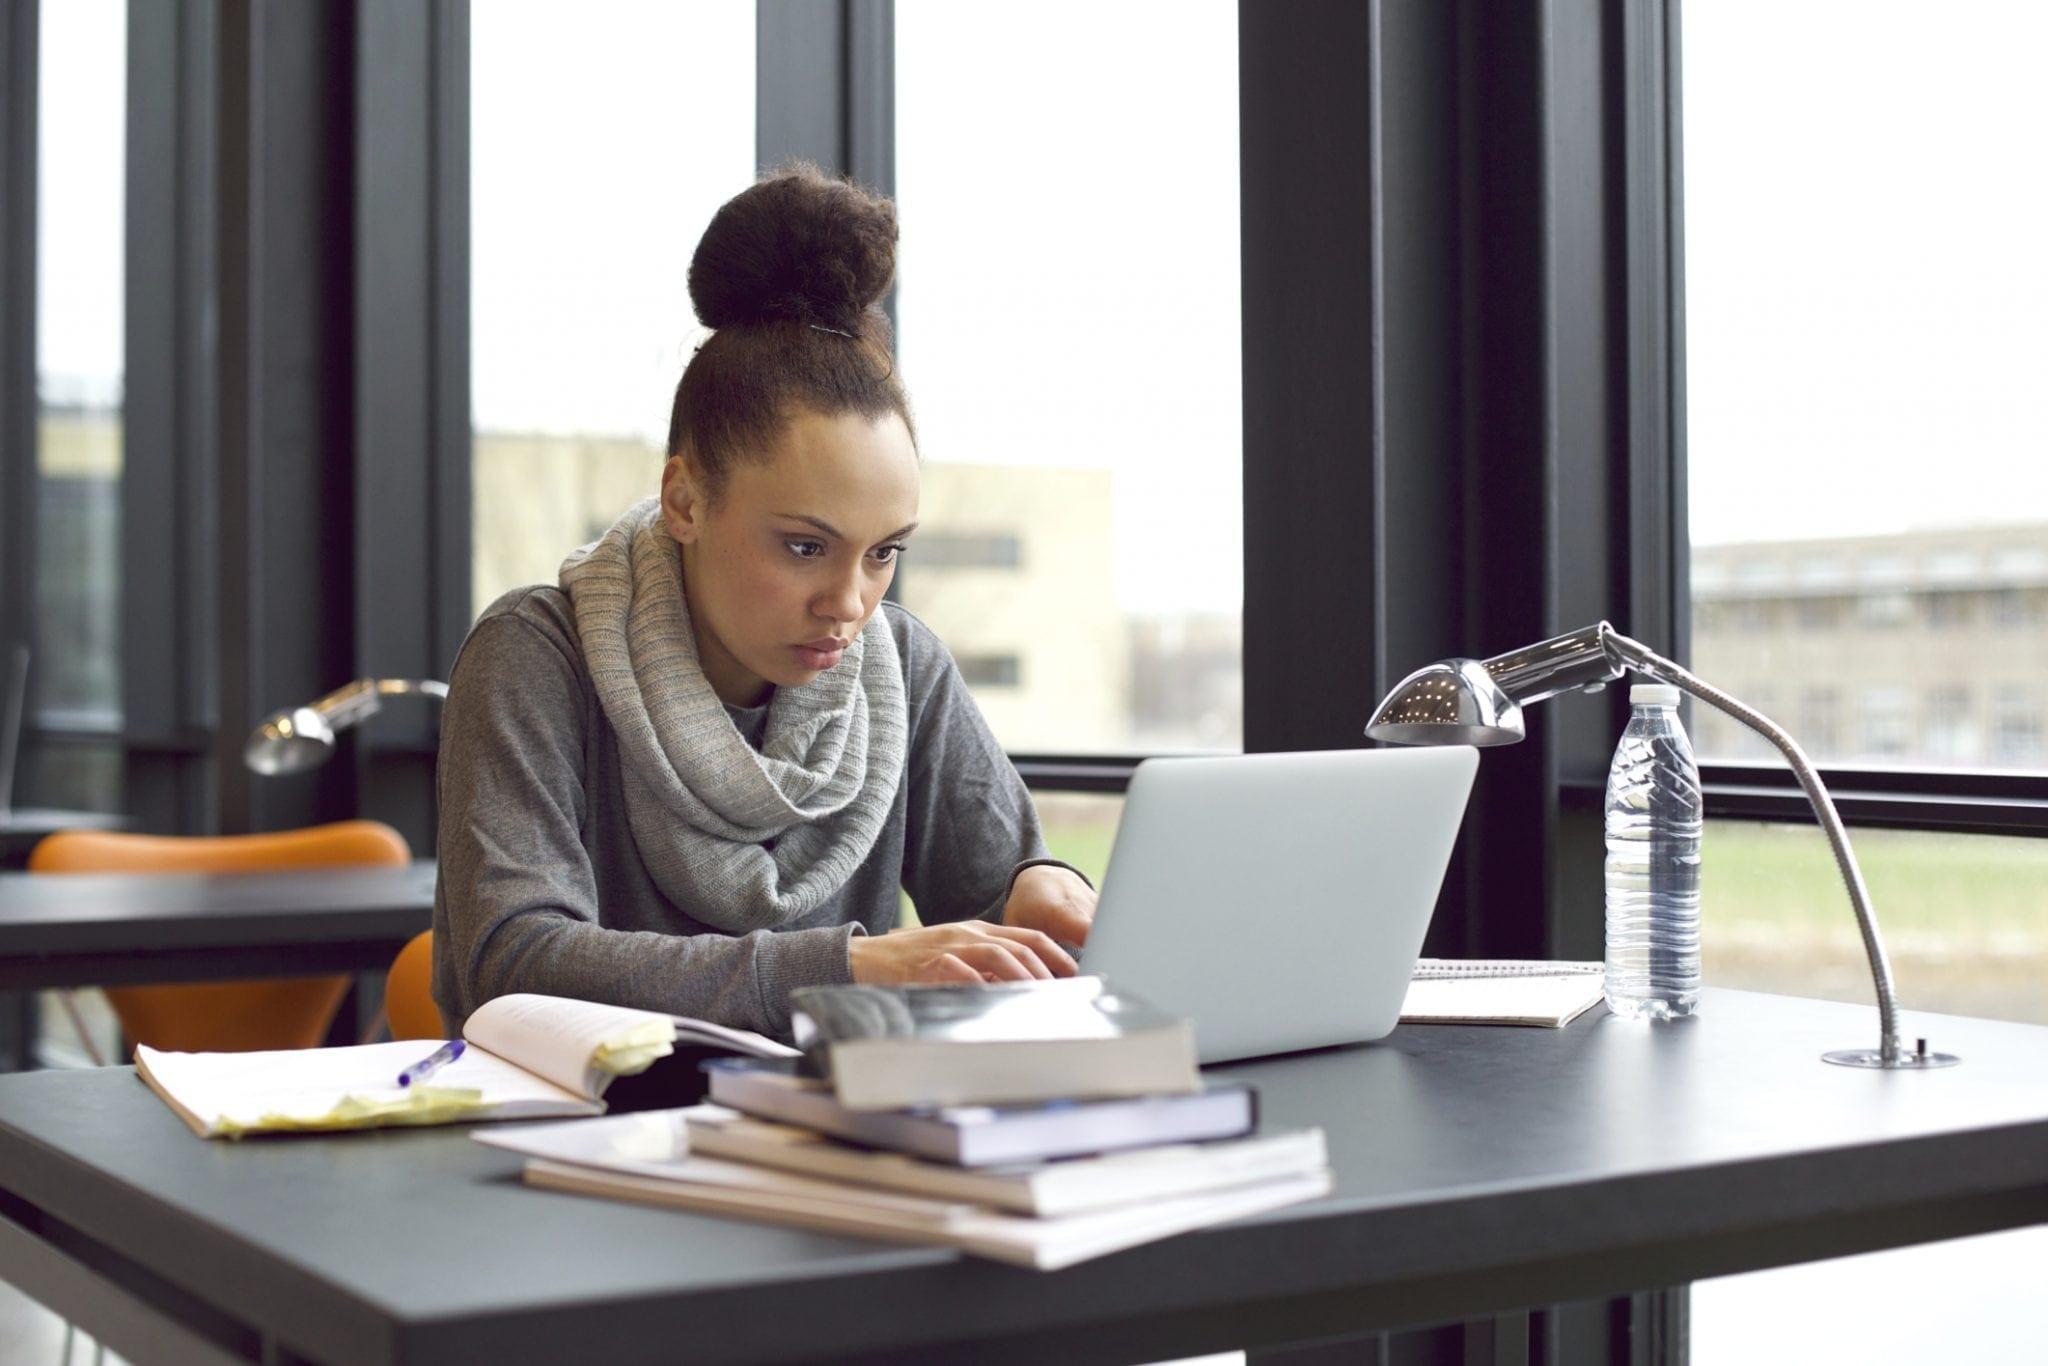 profissional estudando online 3